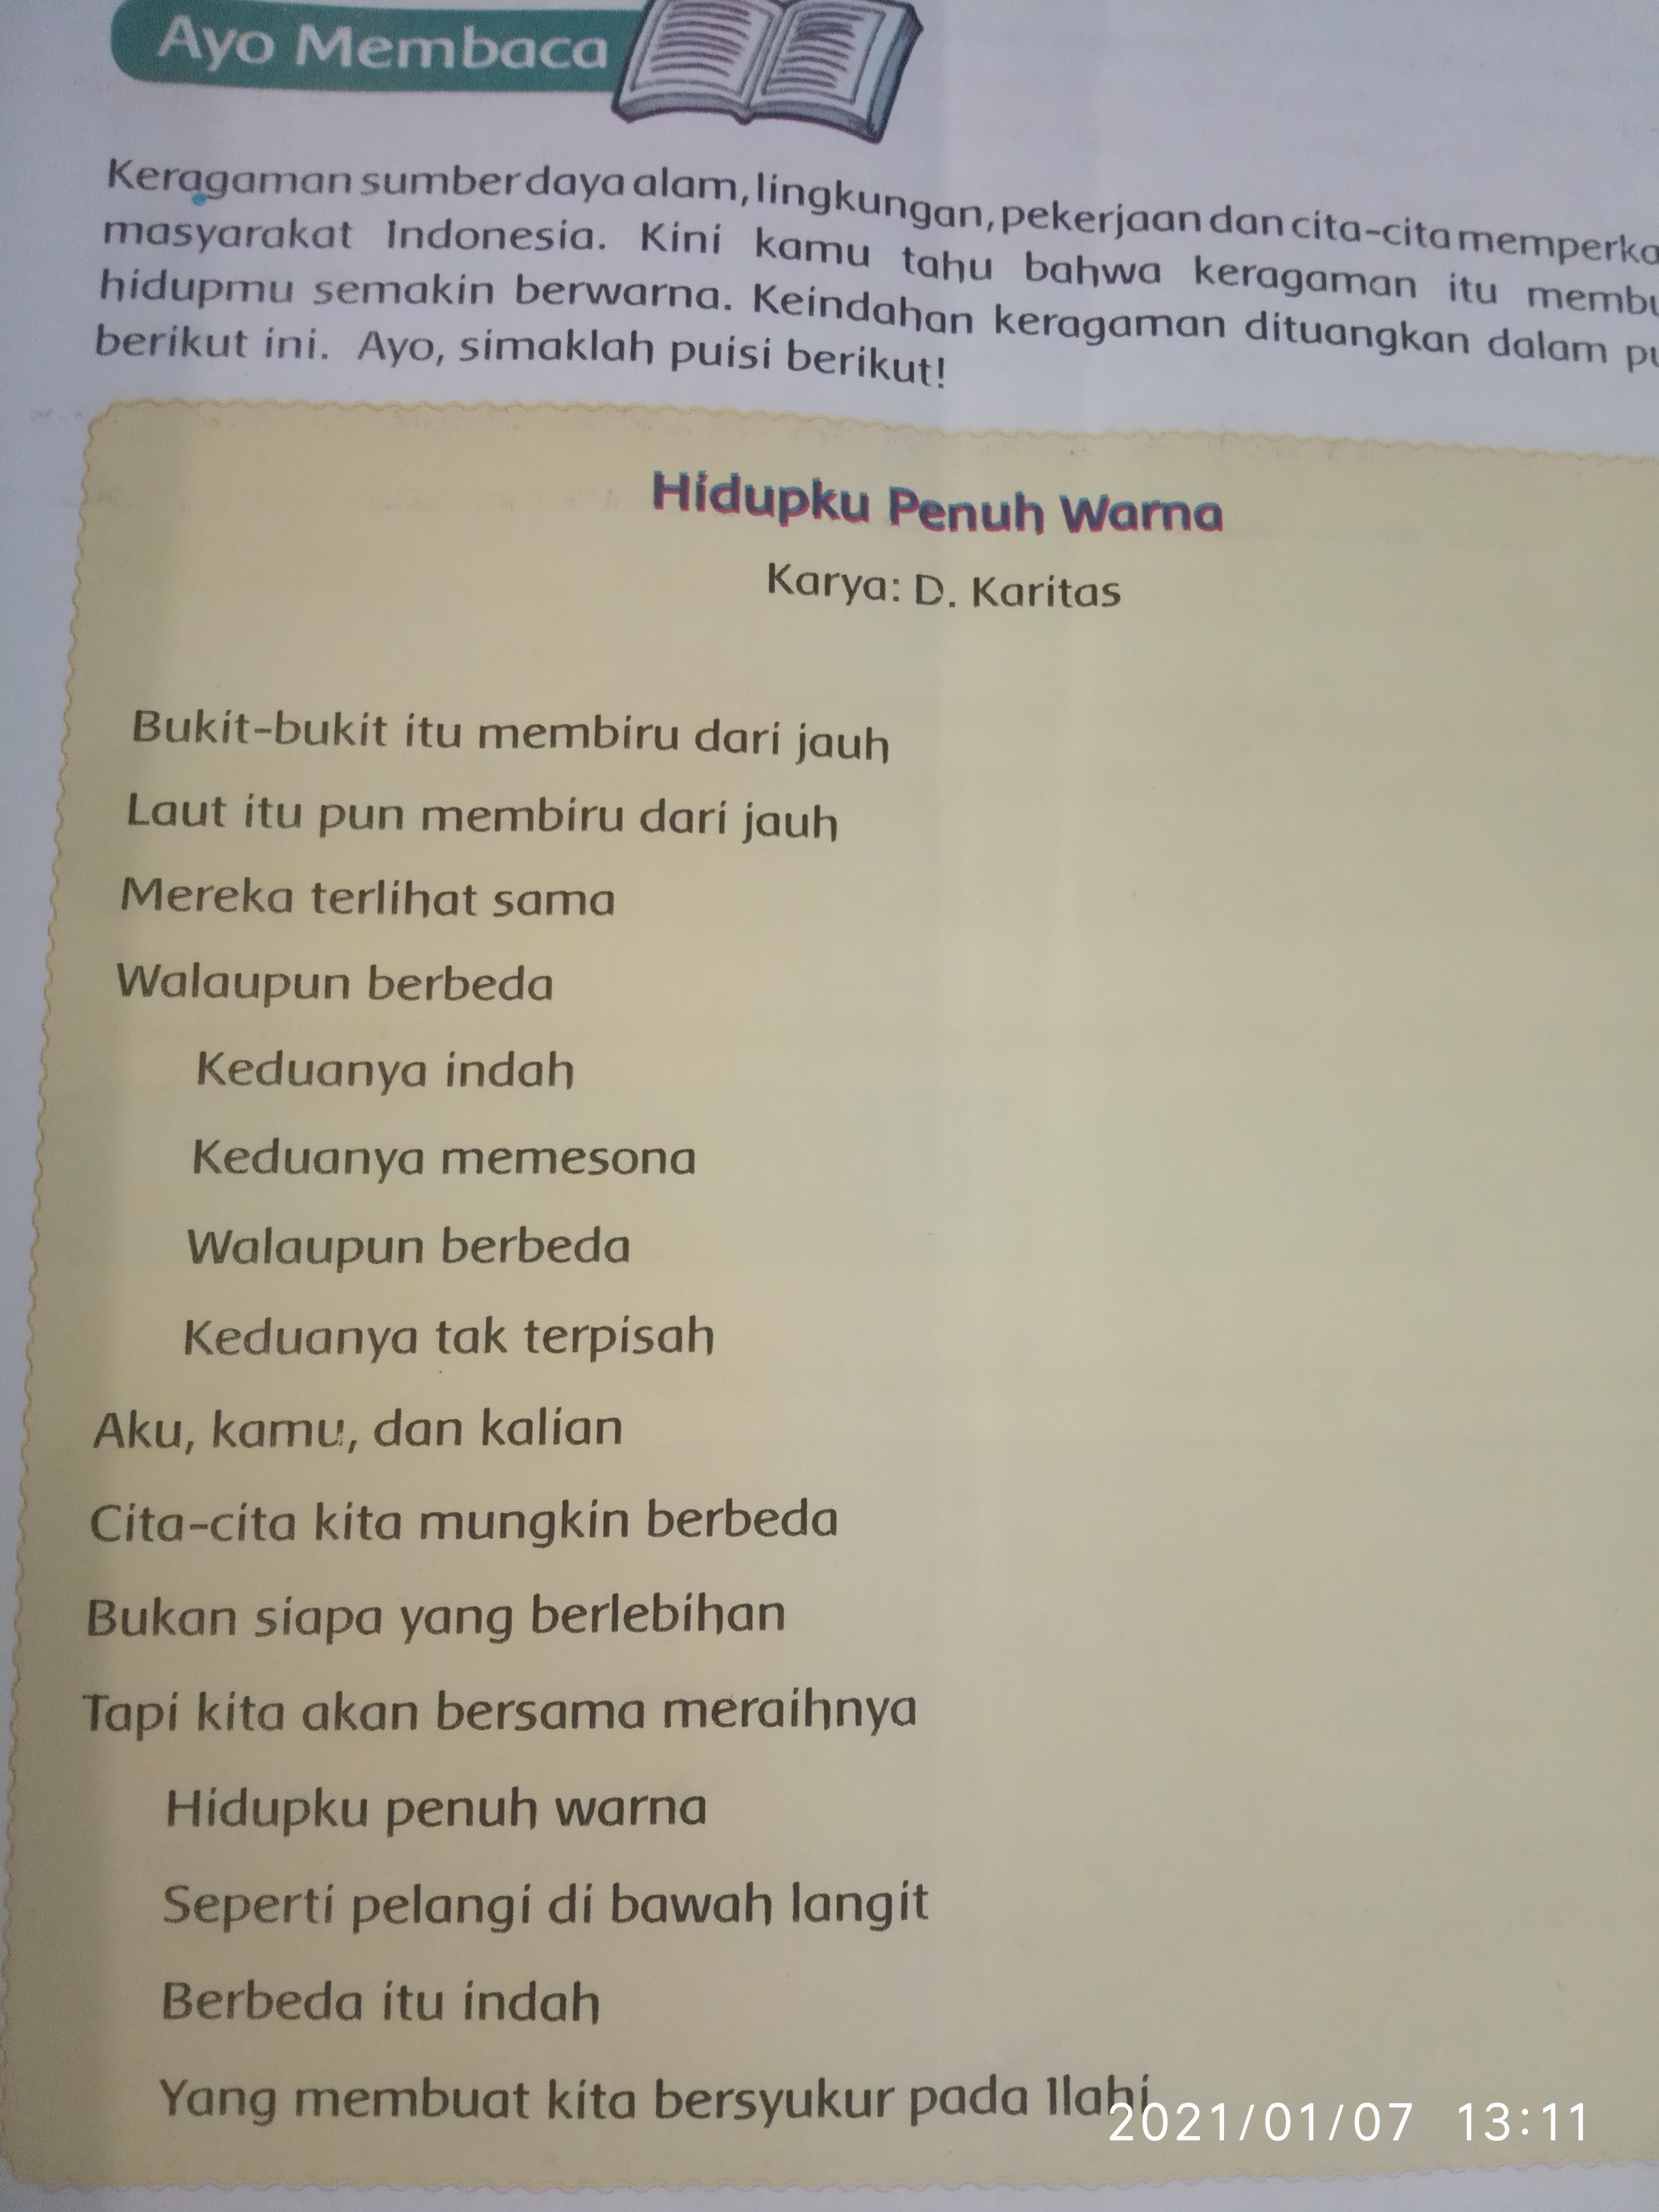 Rima Pada Puisi : puisi, Tentukanlah, Setiap, Puisi, Tersebut?, Mohon, Dibantu, Brainly.co.id